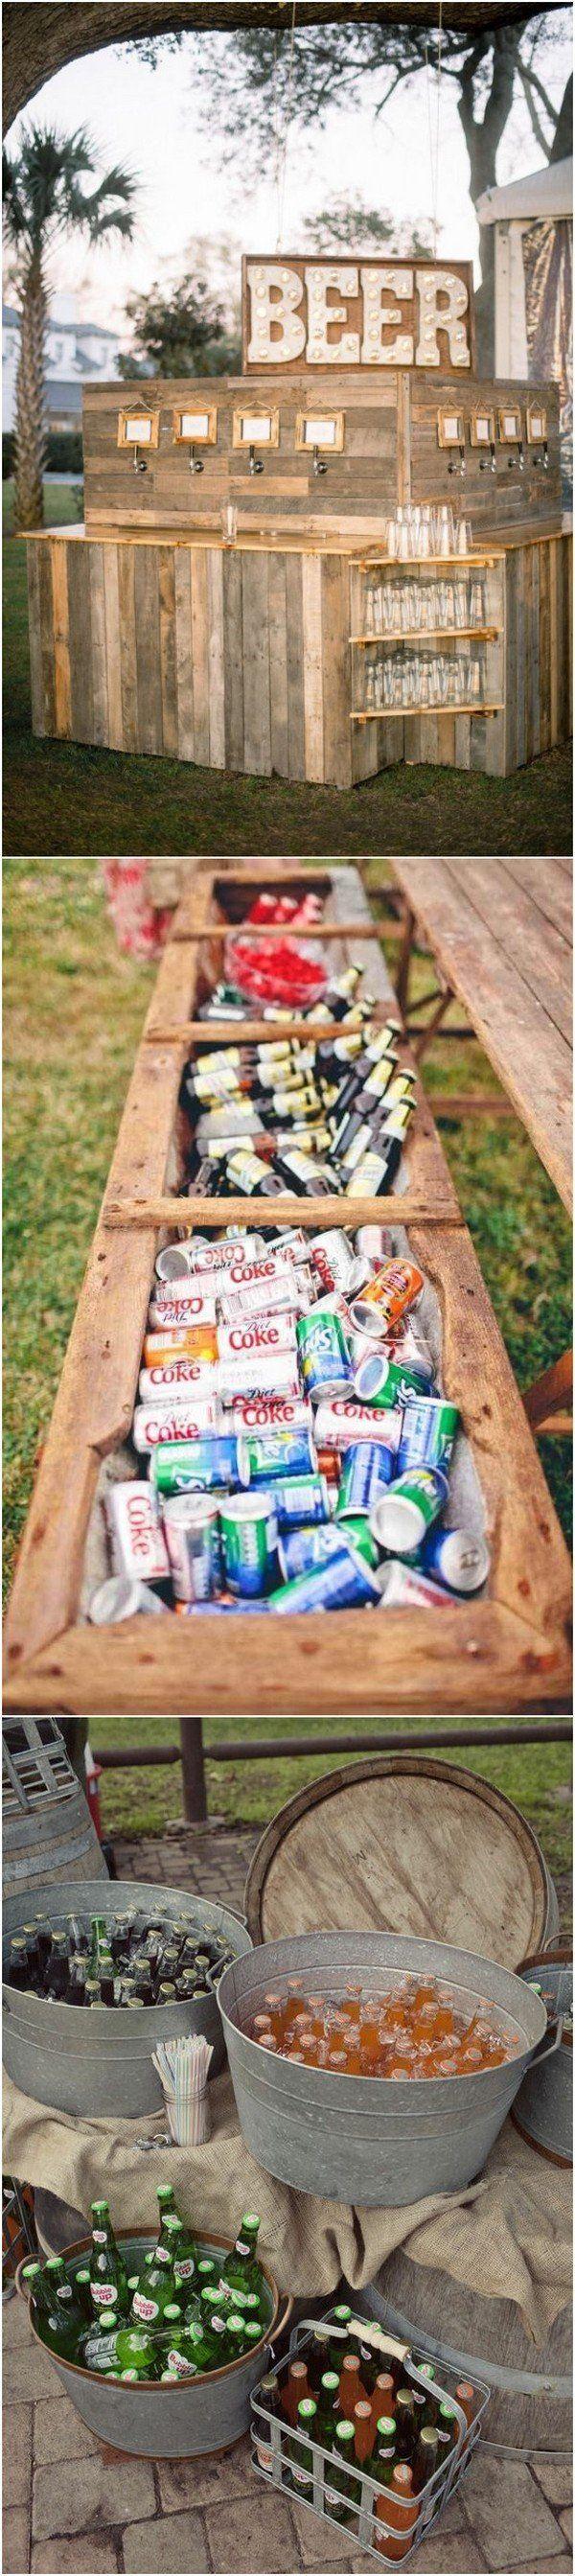 25 Cute Outdoor Wedding Foods Ideas On Pinterest